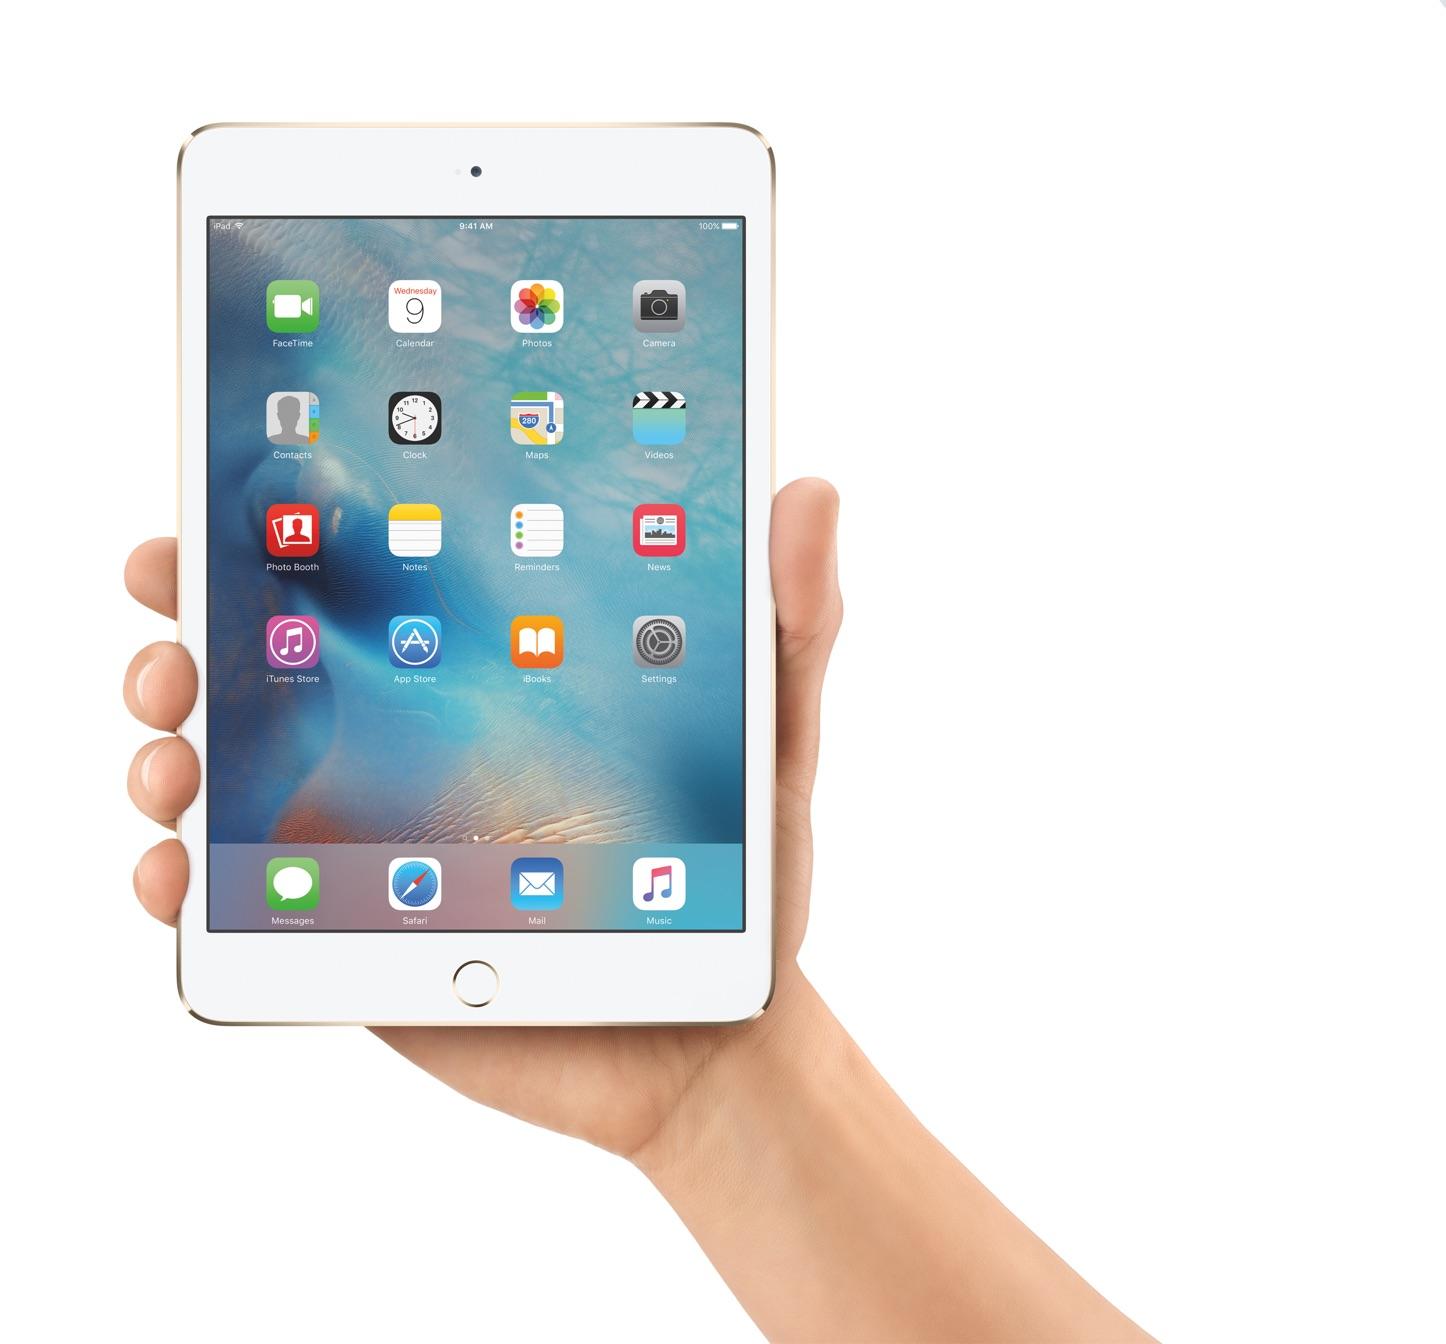 iPadMini4-Hand_iOS9-Homescreen-PRINT.jpg